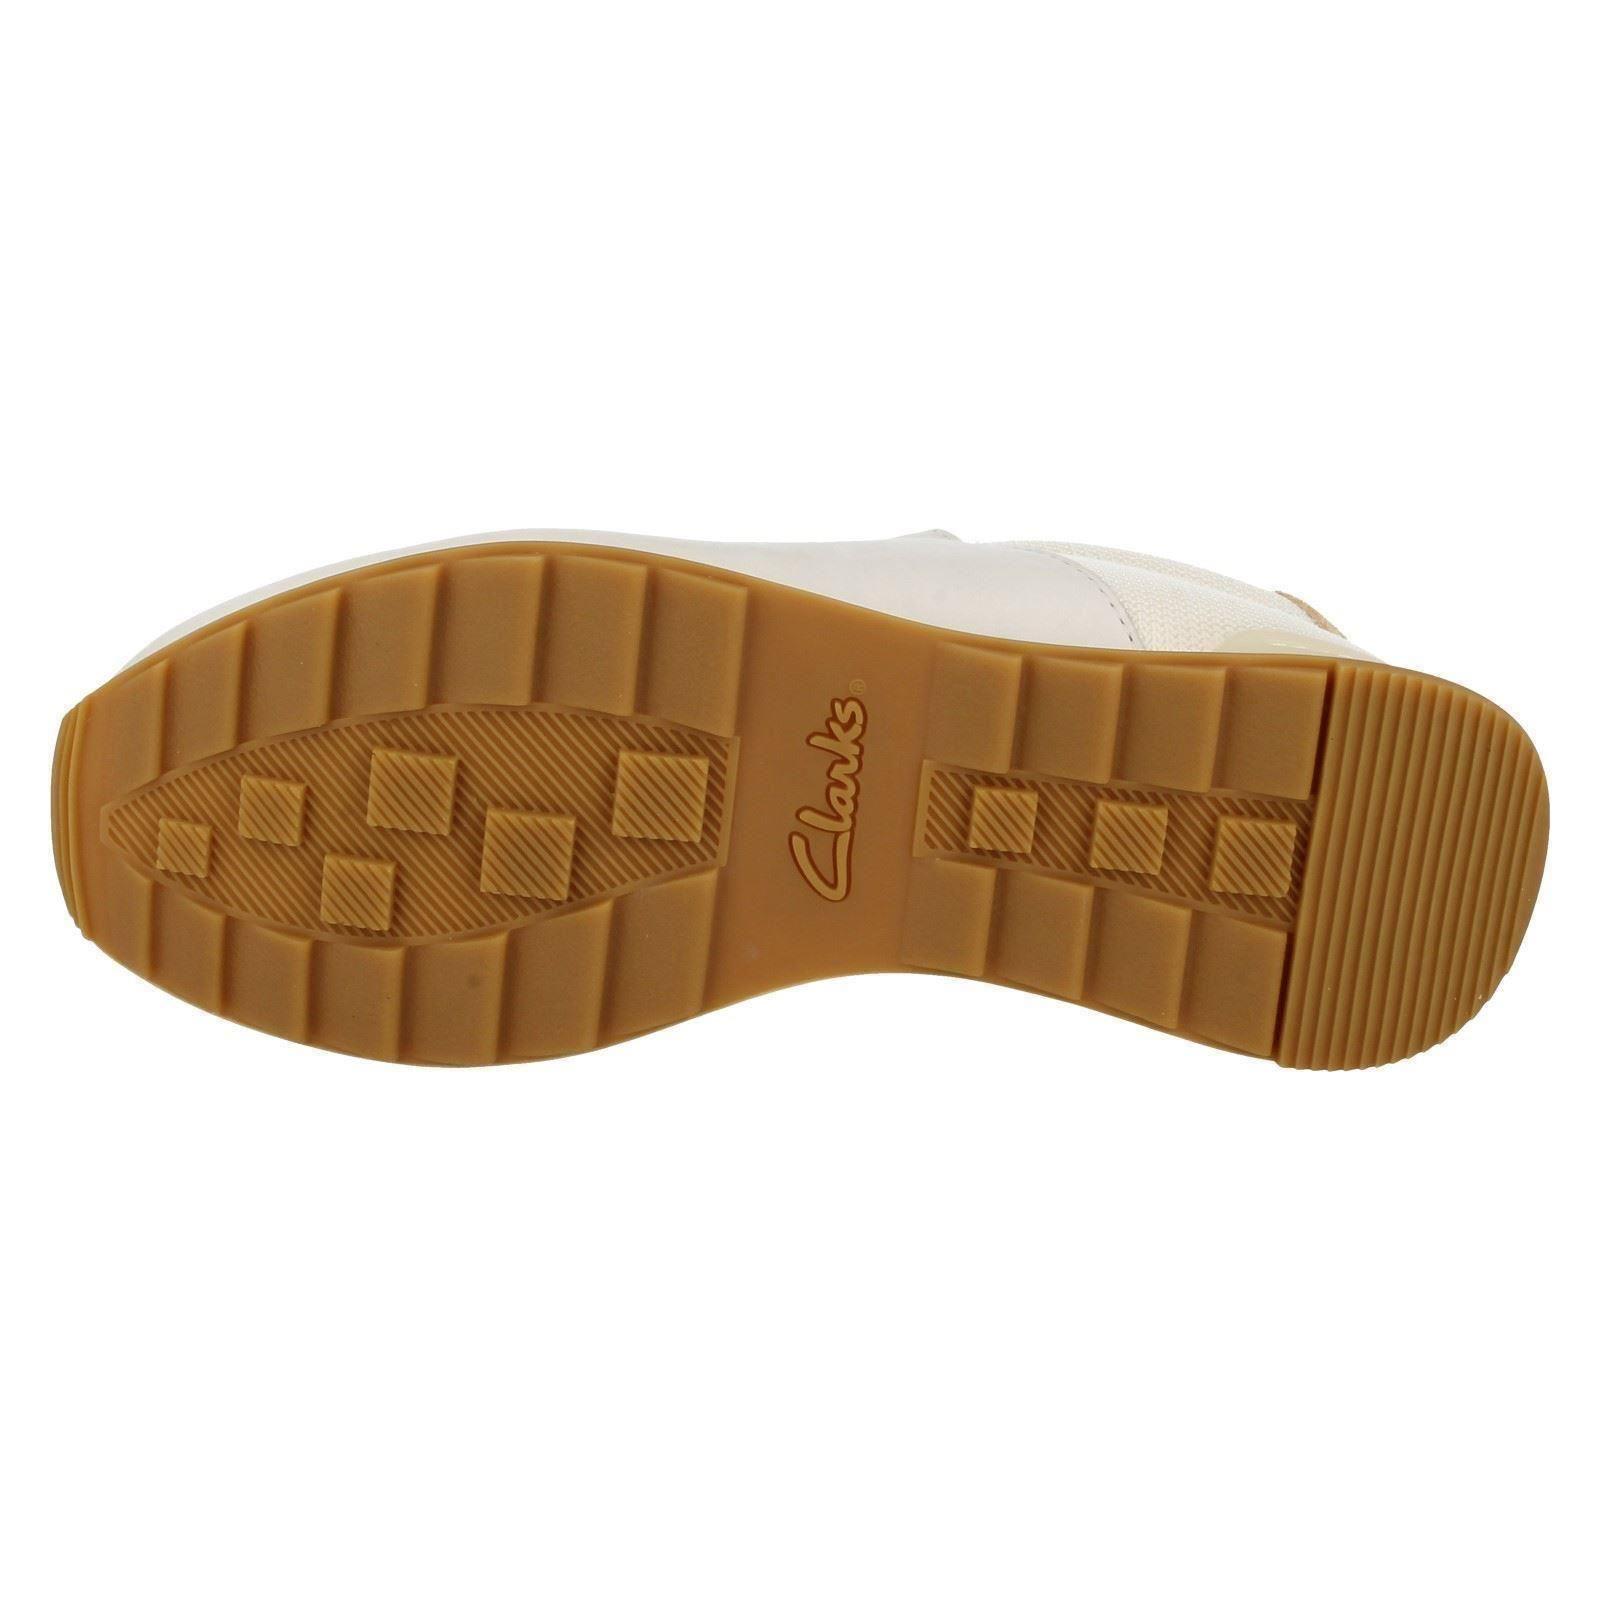 Damen Clarks Freizeit Geschnürte Turnschuhe Stil Stil Turnschuhe Schuhe Floura Mix 1dc9ef